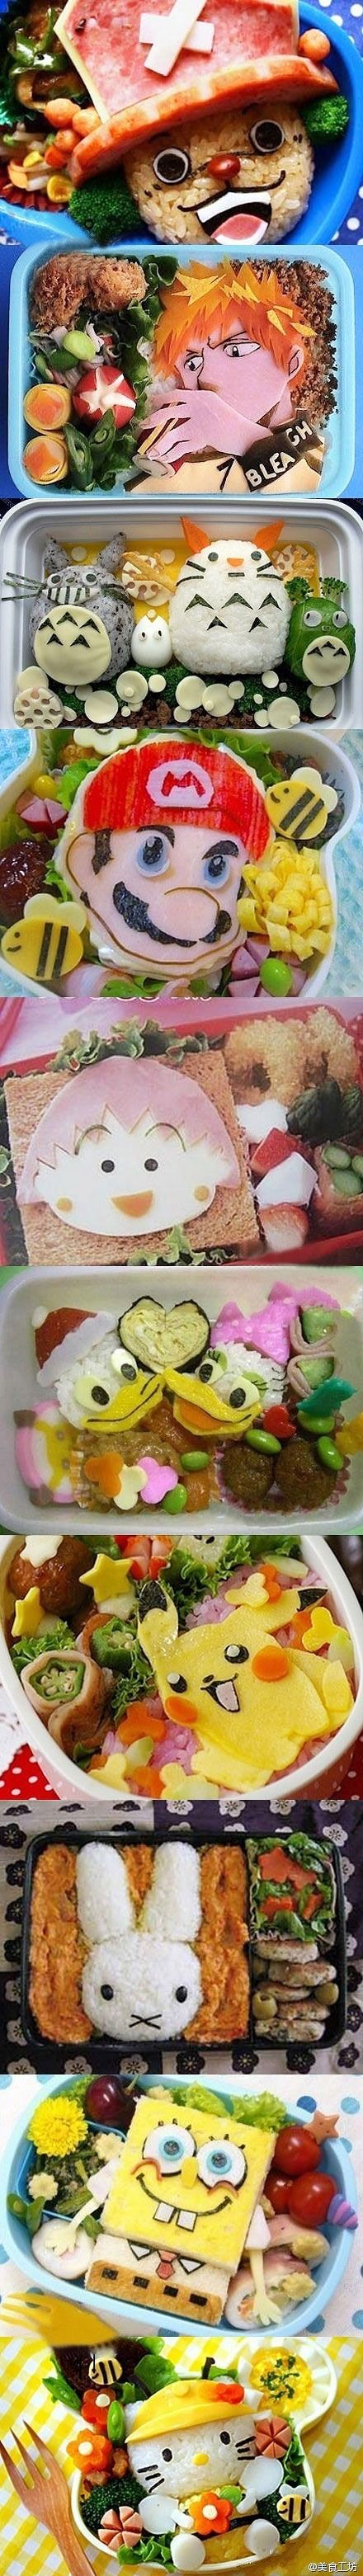 funny-creative-food-decorations-cartoons